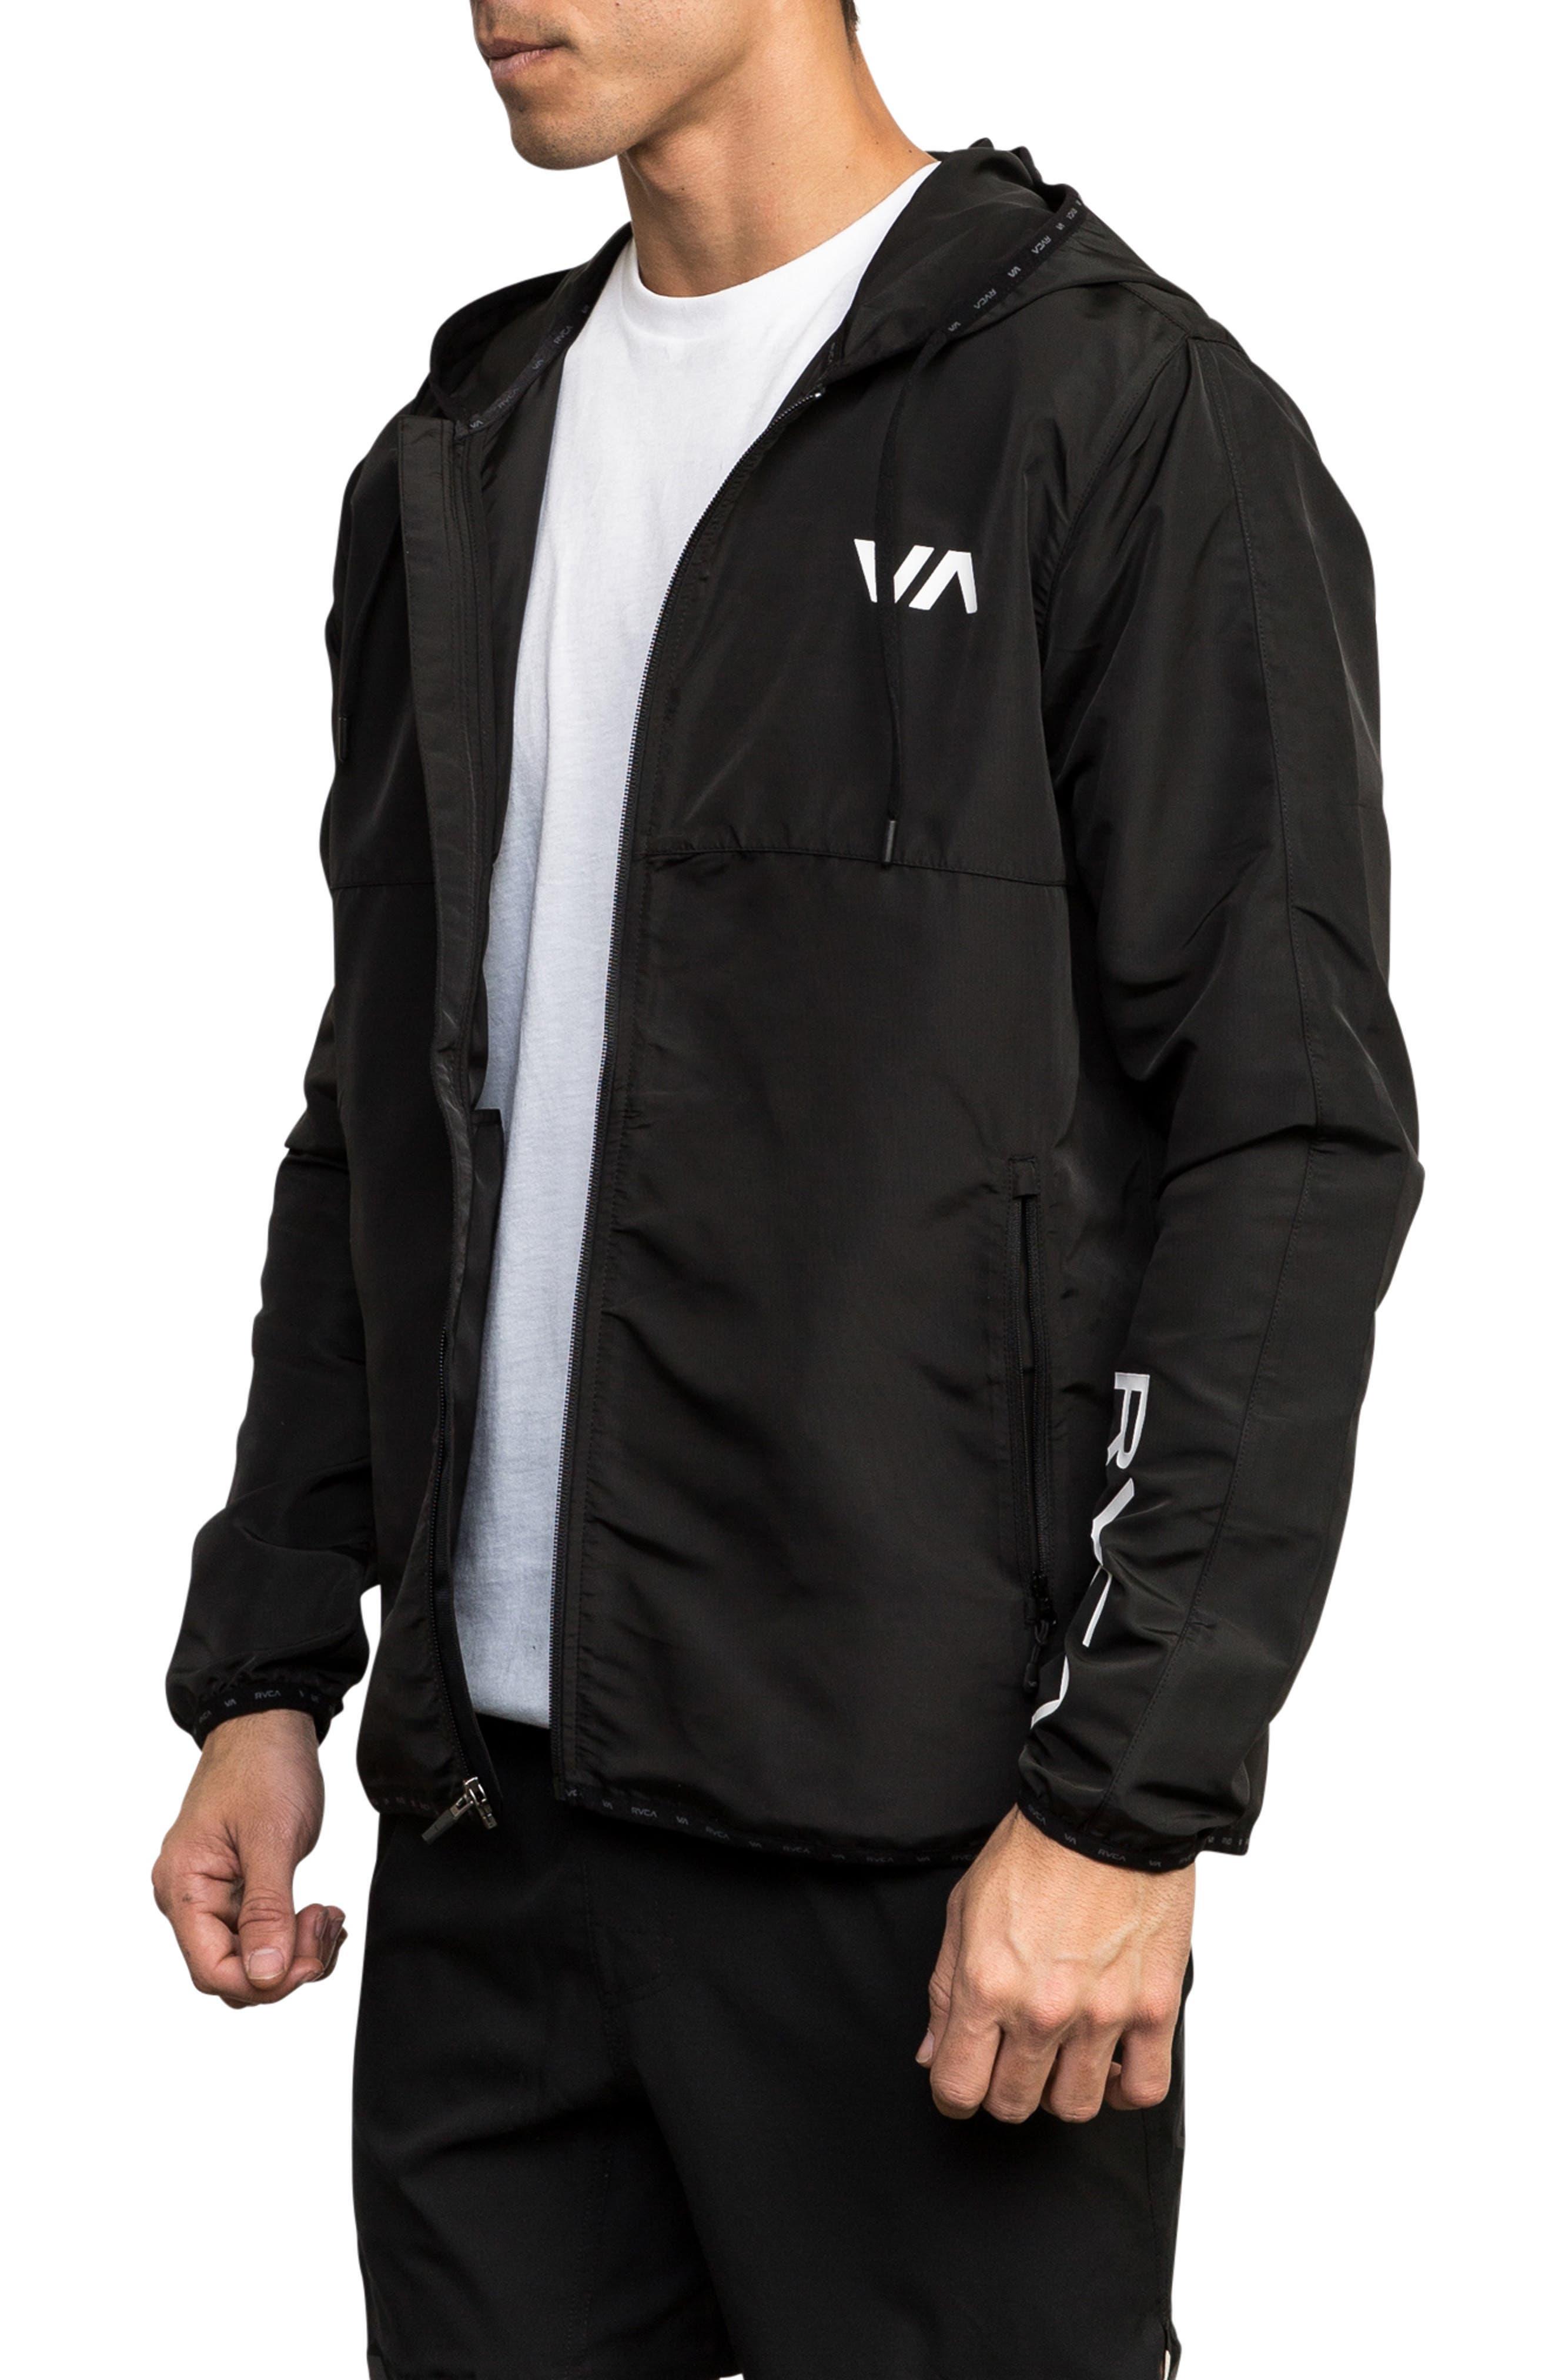 Axe Packable Water Resistant Jacket,                             Alternate thumbnail 3, color,                             BLACK